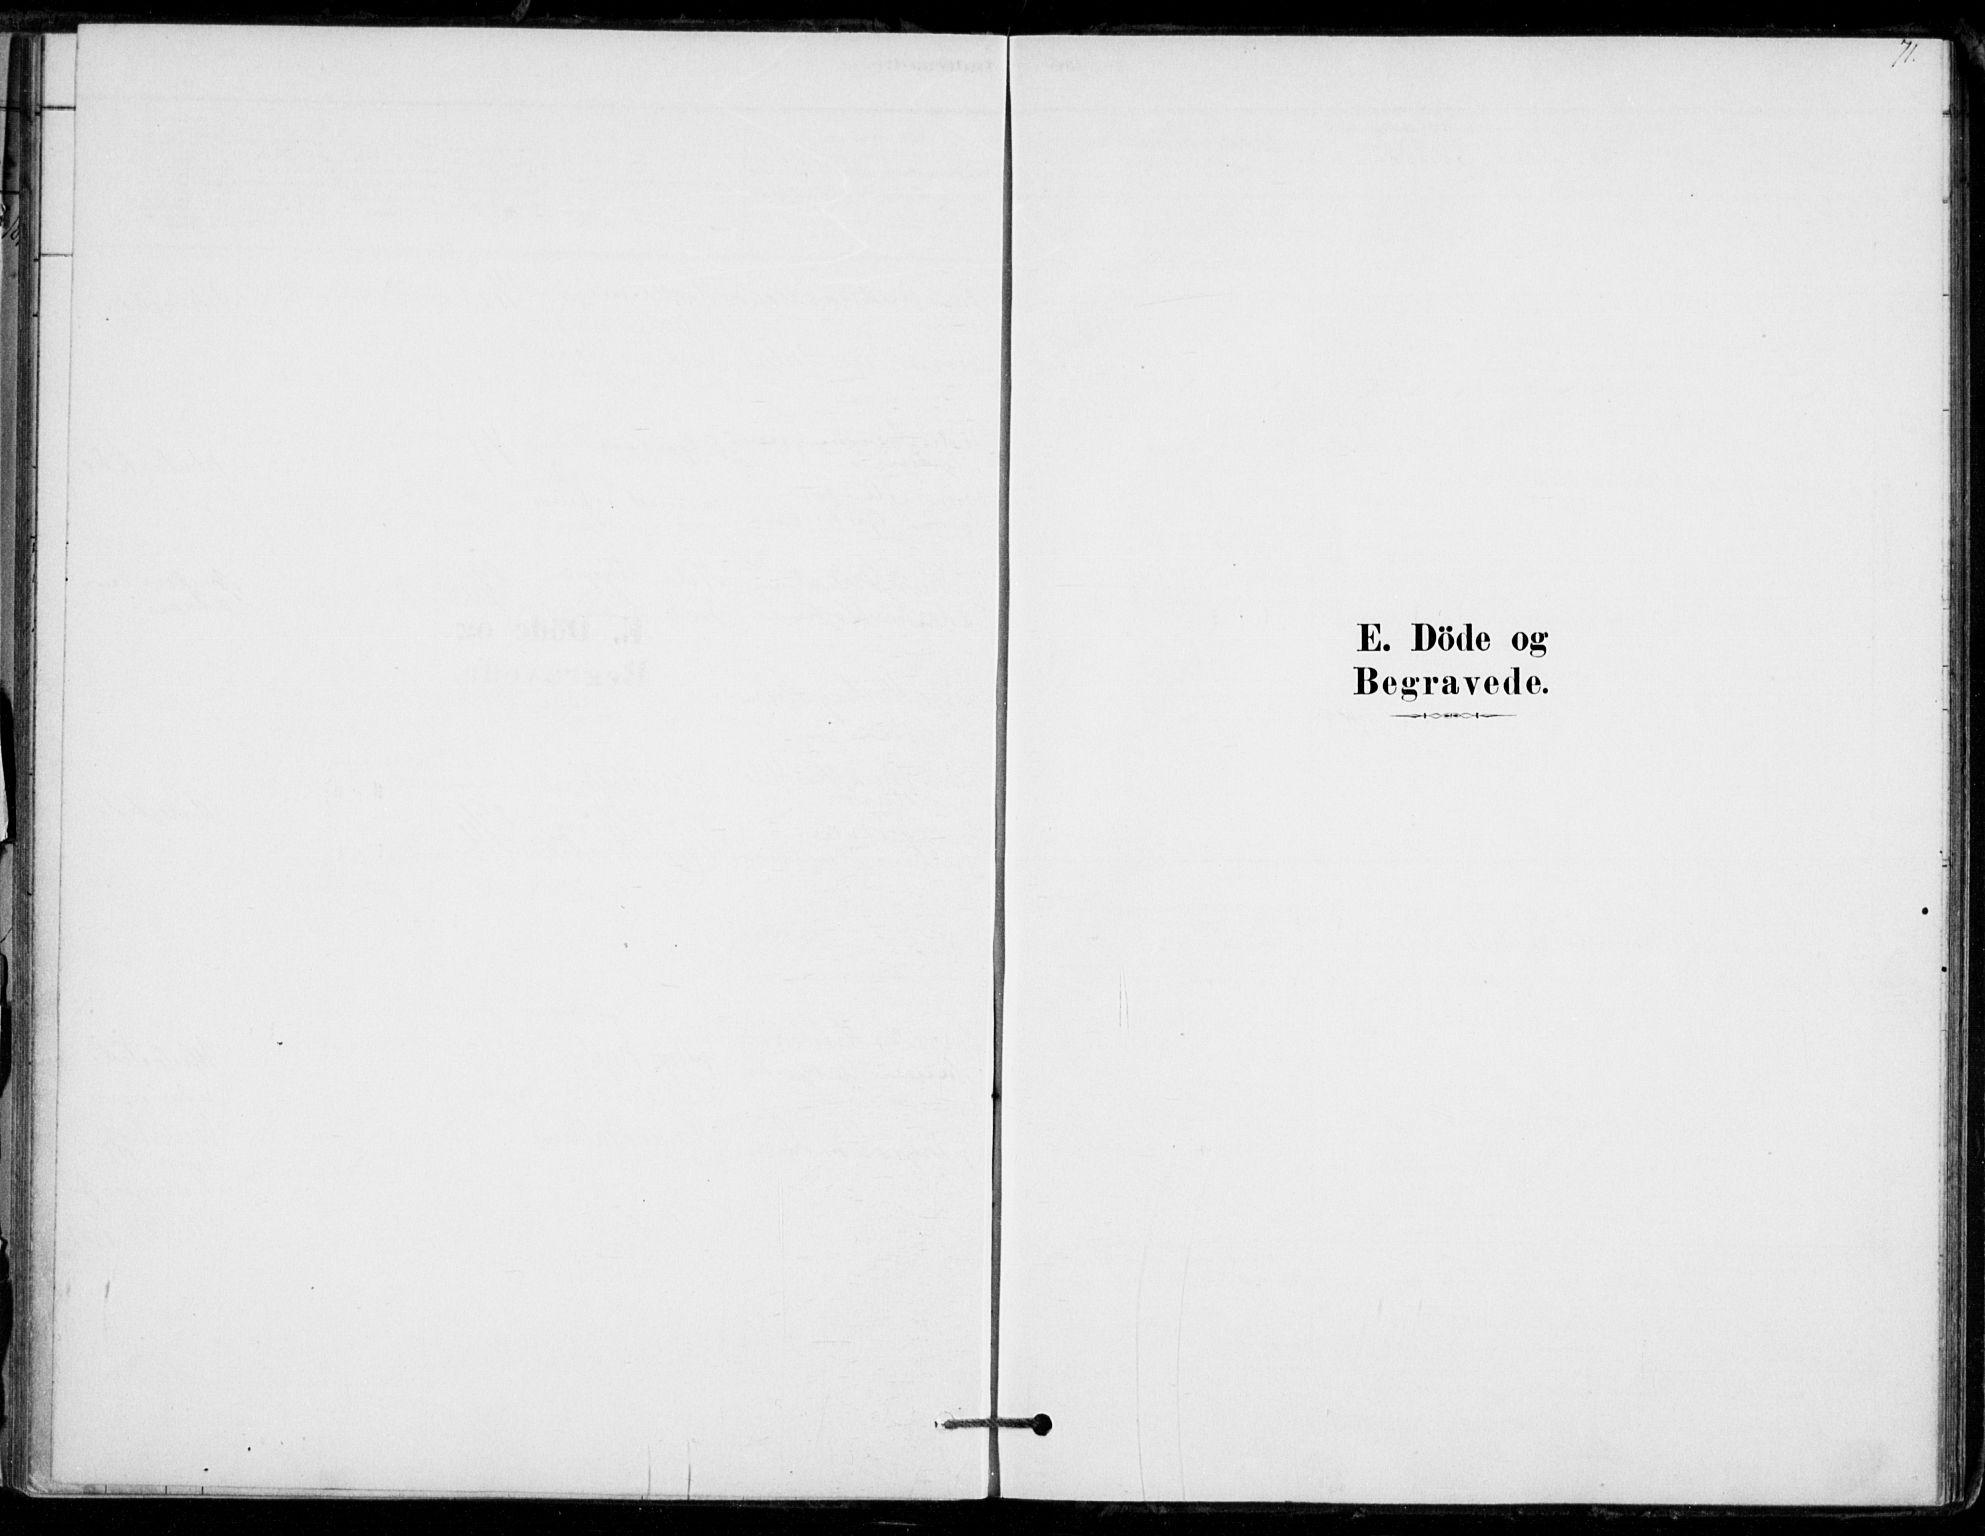 SAKO, Hof kirkebøker, F/Fb/L0001: Ministerialbok nr. II 1, 1878-1907, s. 71